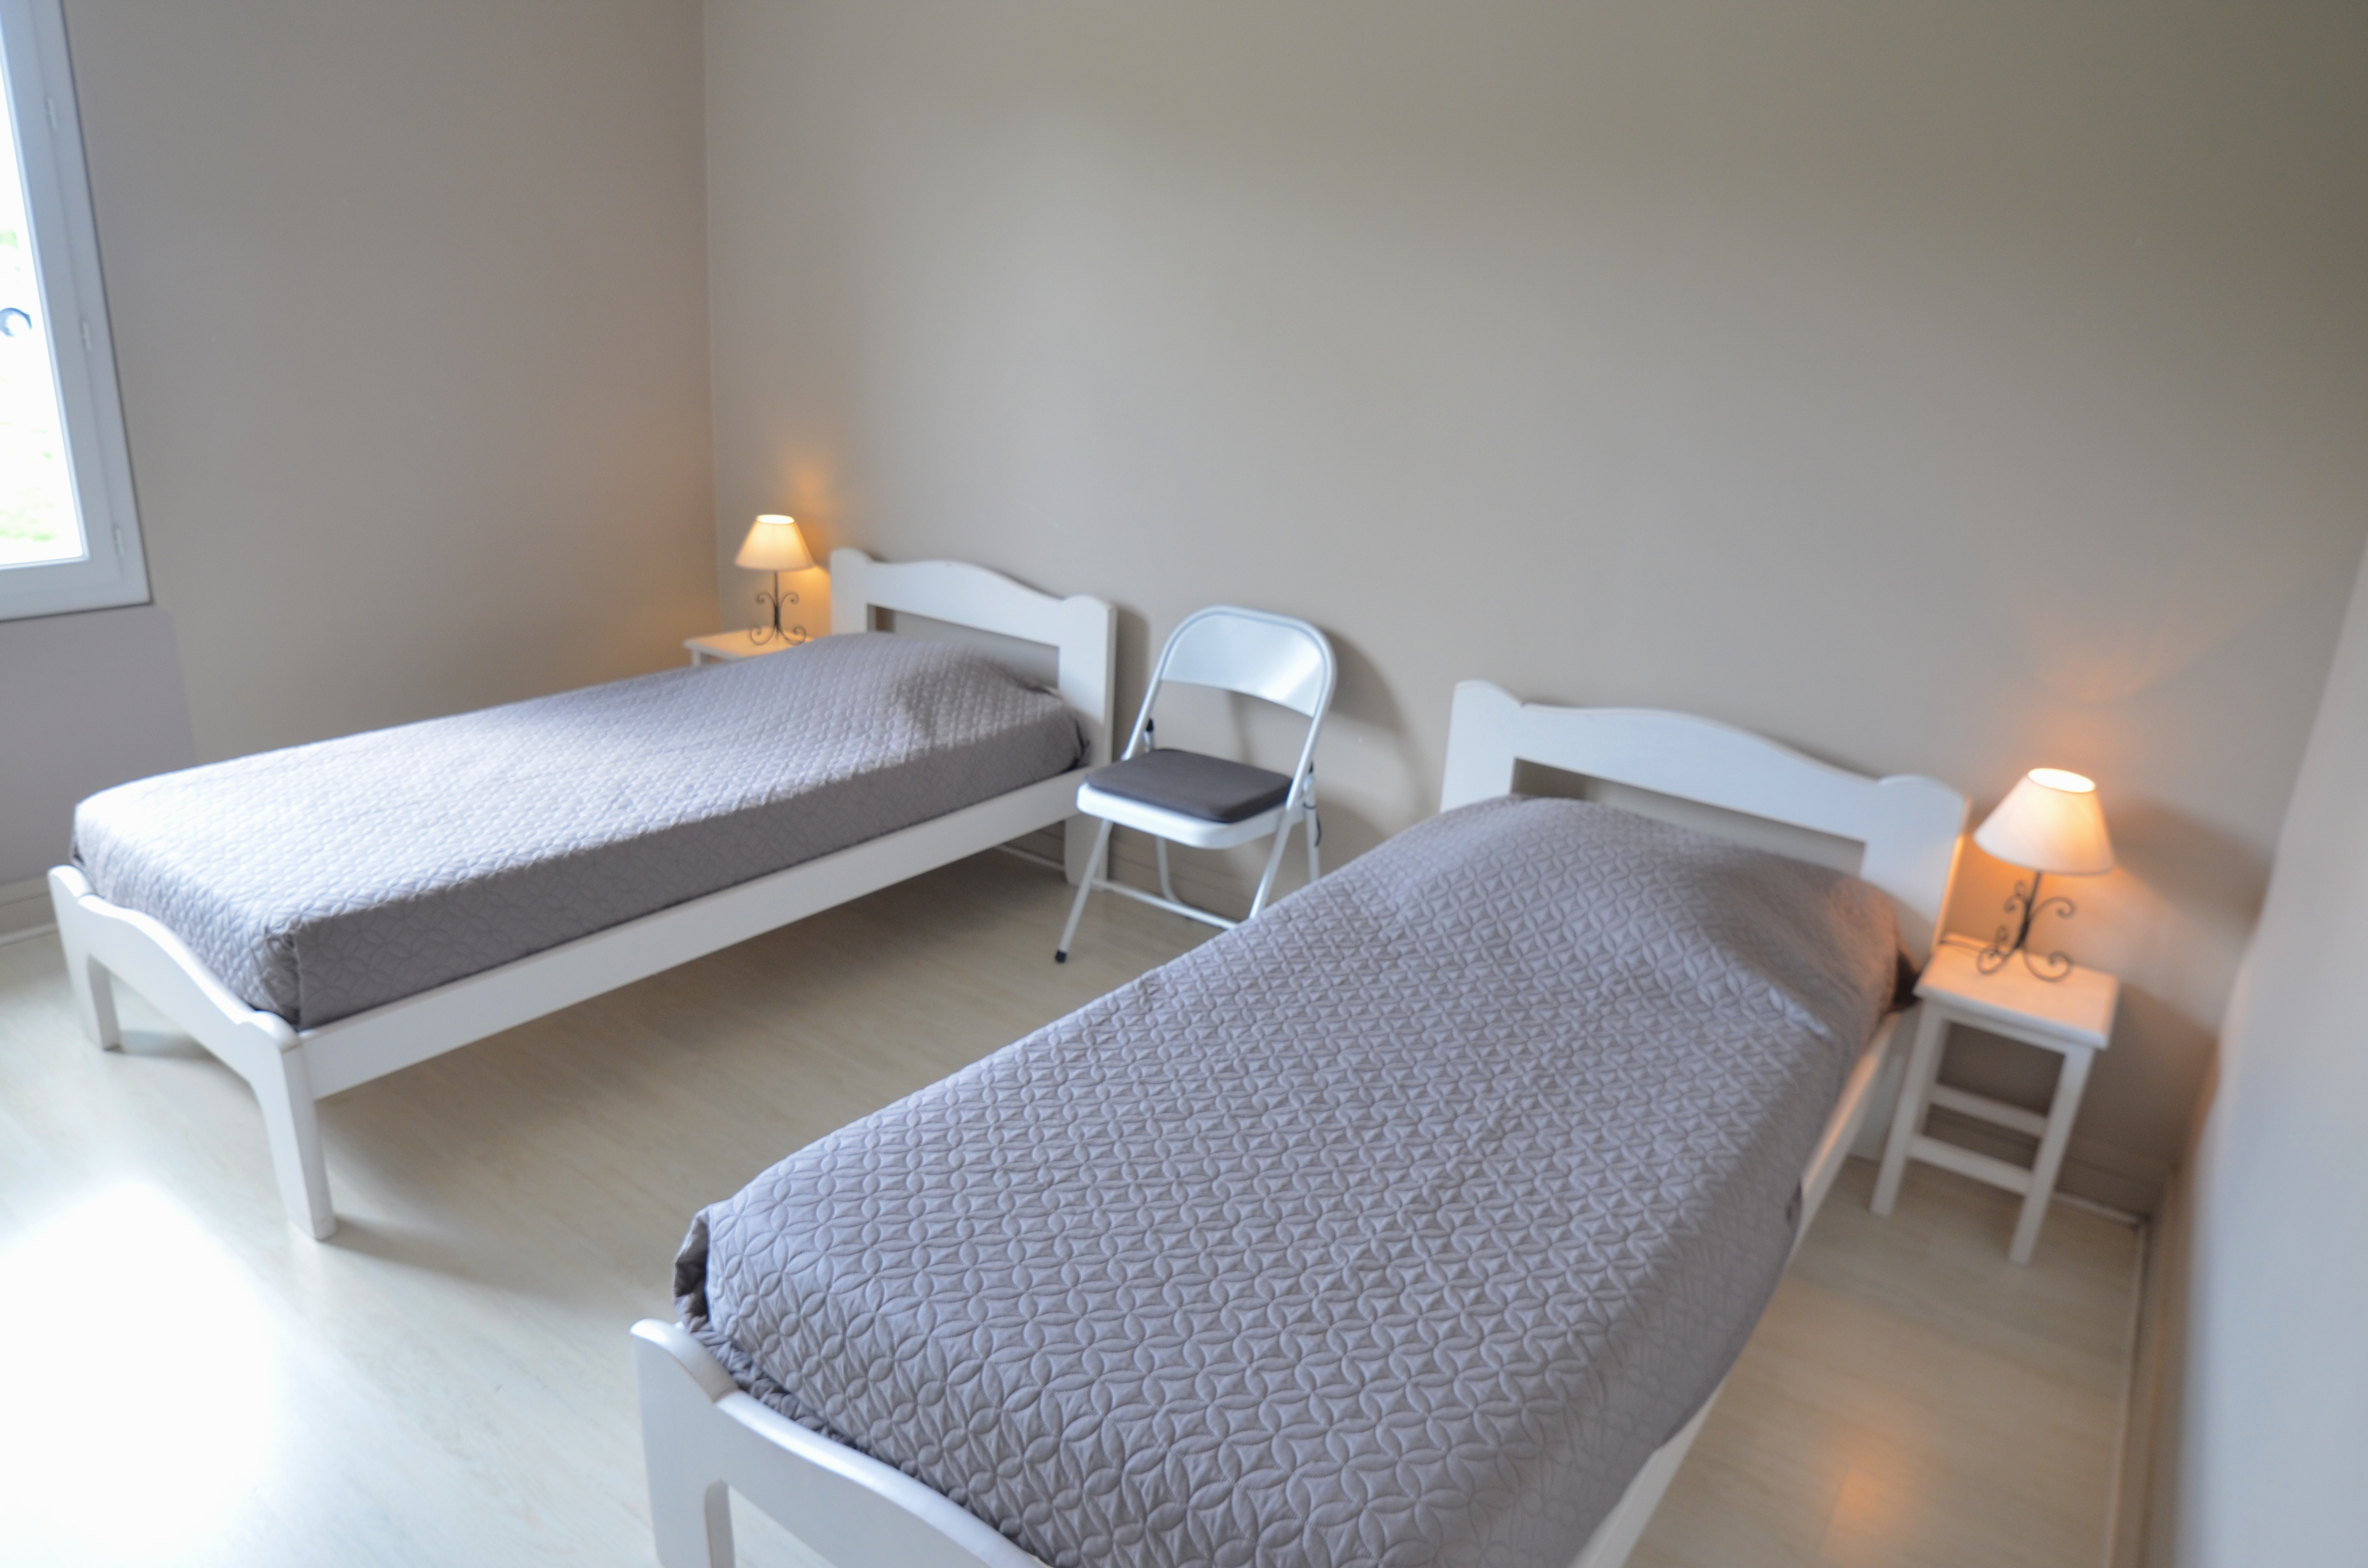 location salle avec couchage normandie